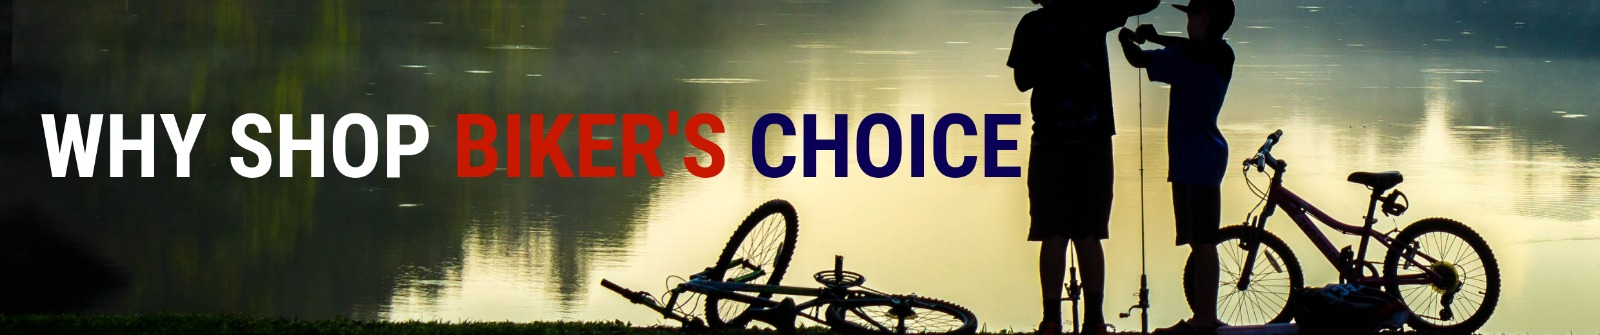 Why Shop Biker's Choice